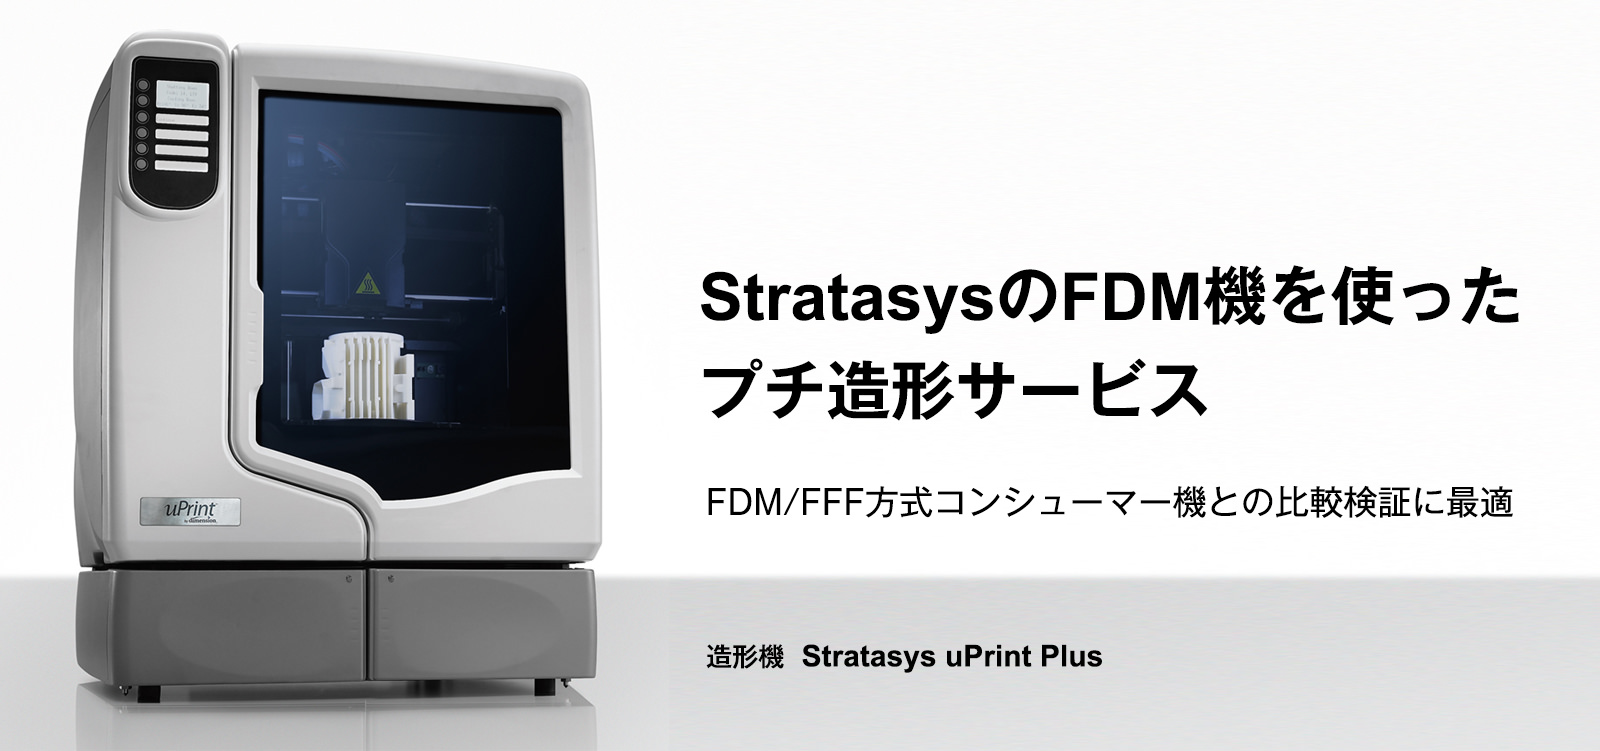 uPrint-3d-print-service-1